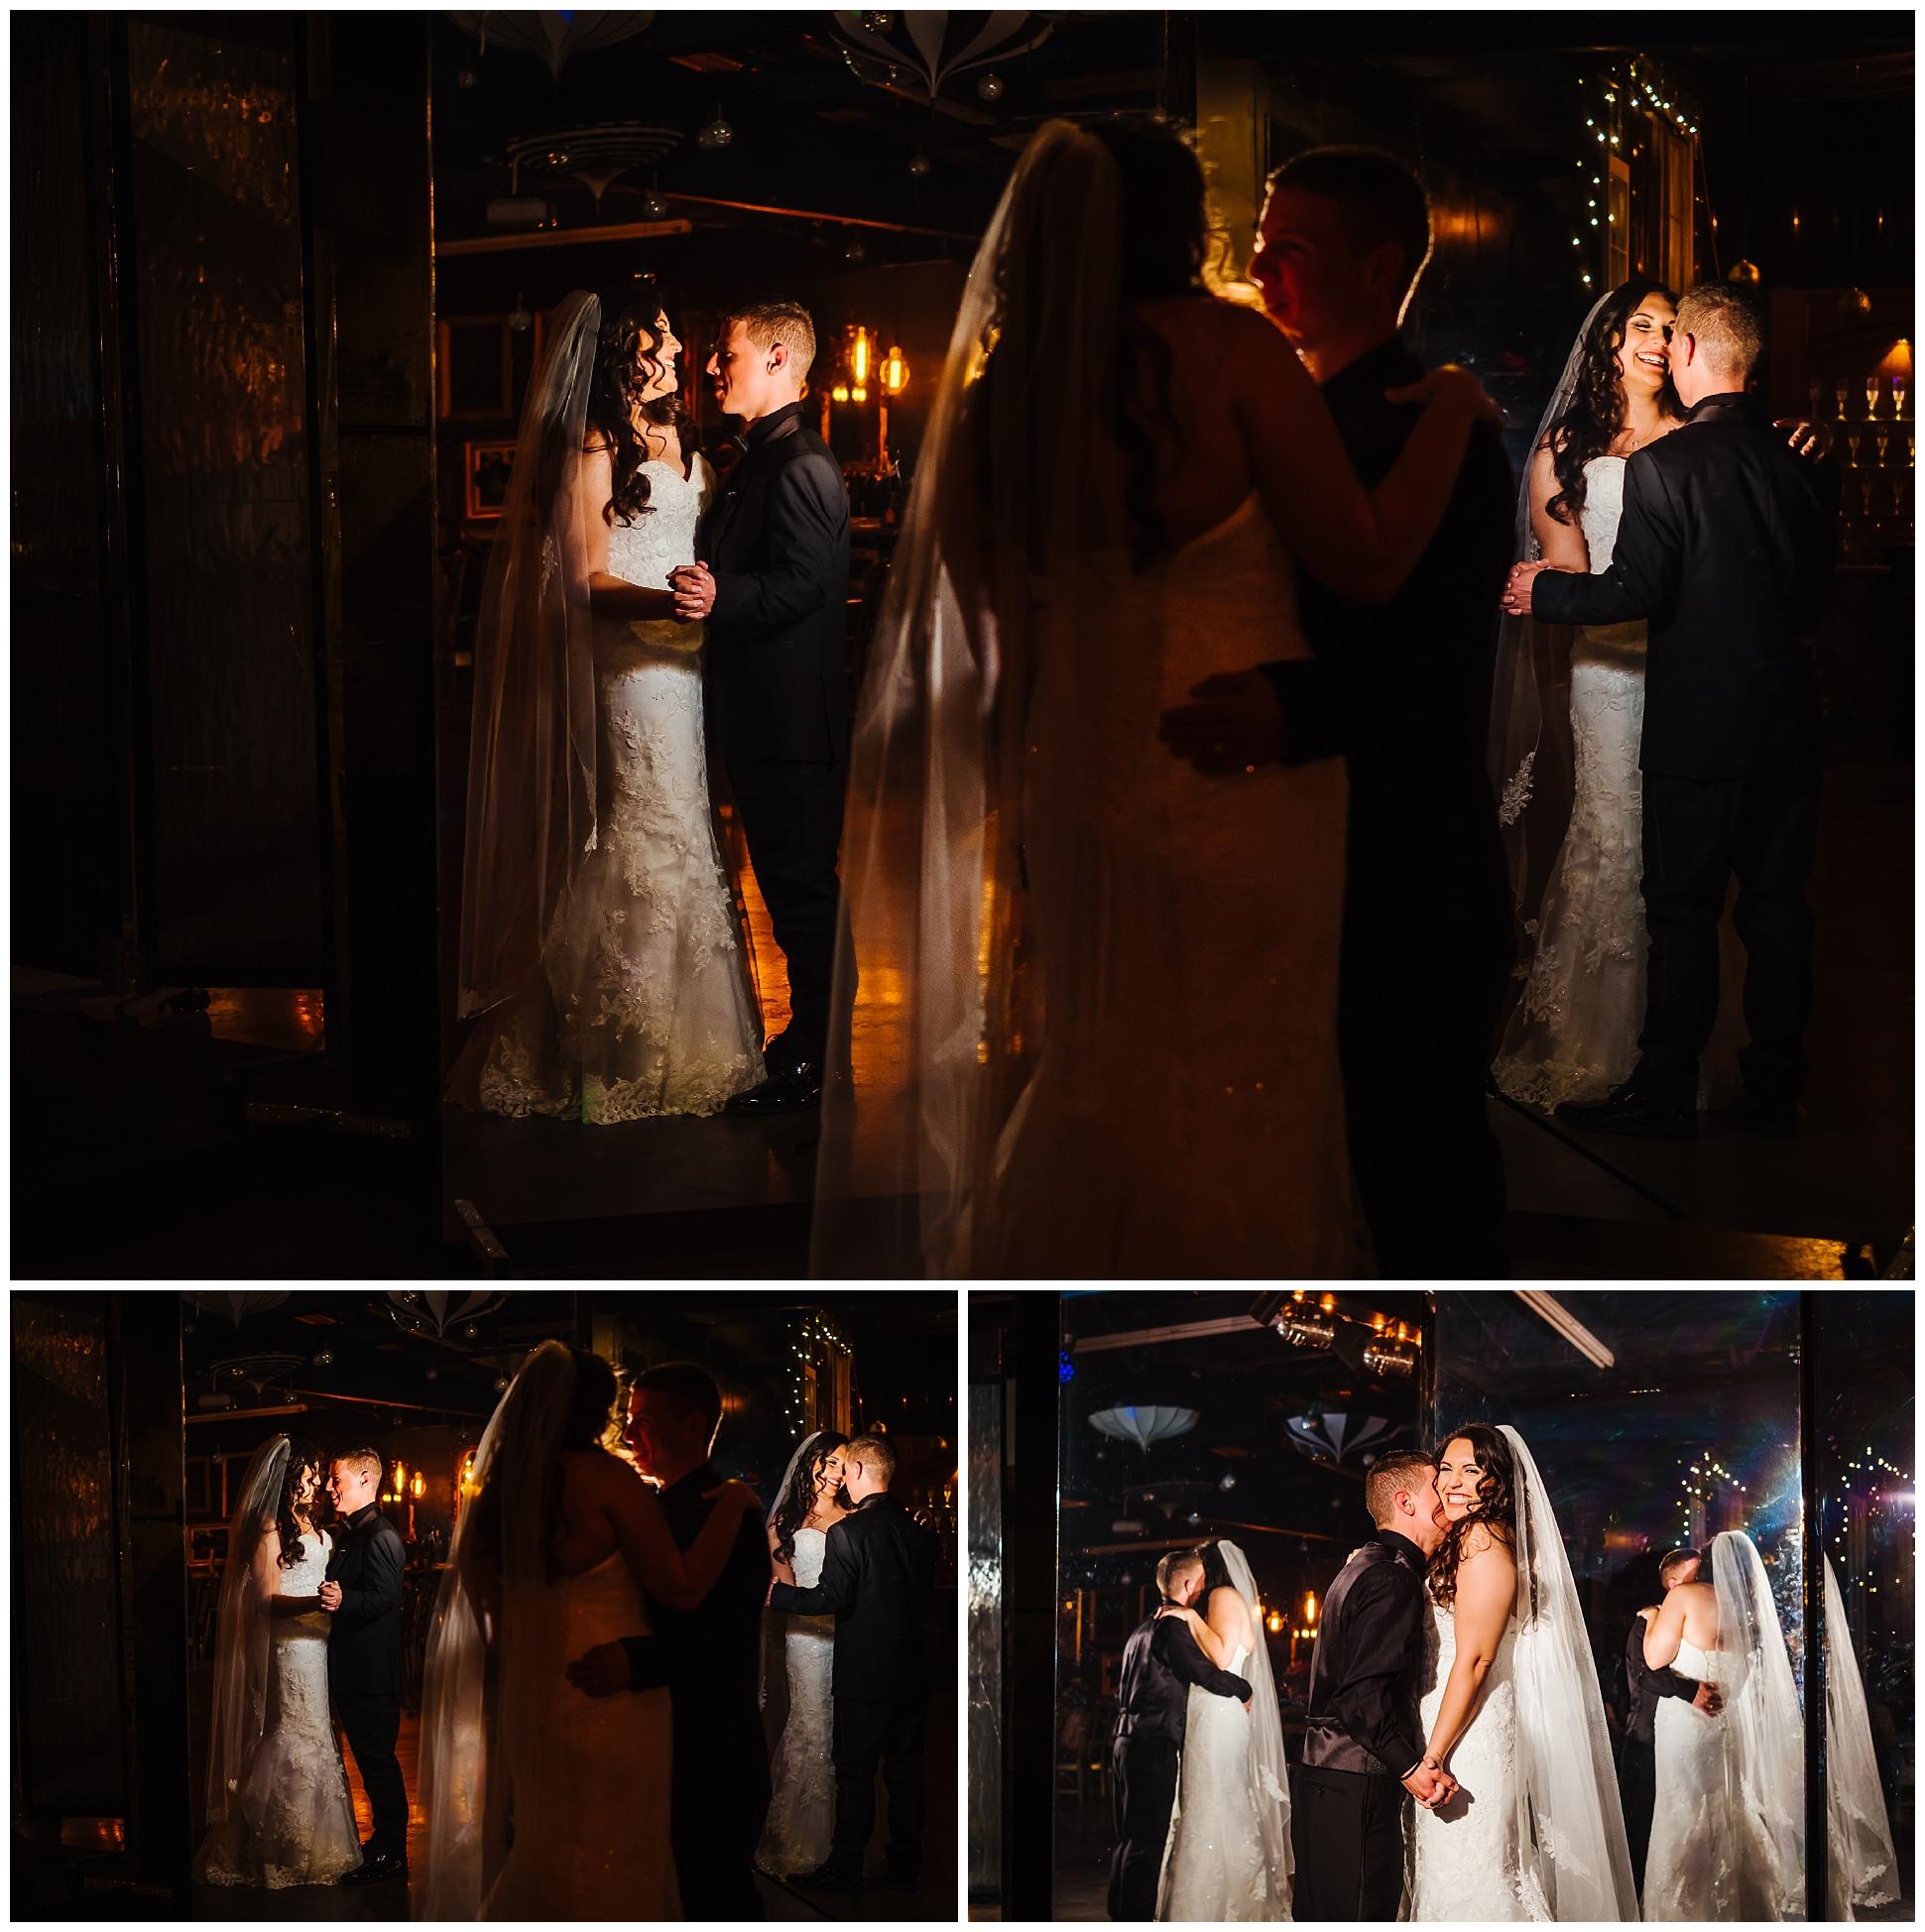 tampa-wedding-photographer-unique-indoor-venue_0041.jpg